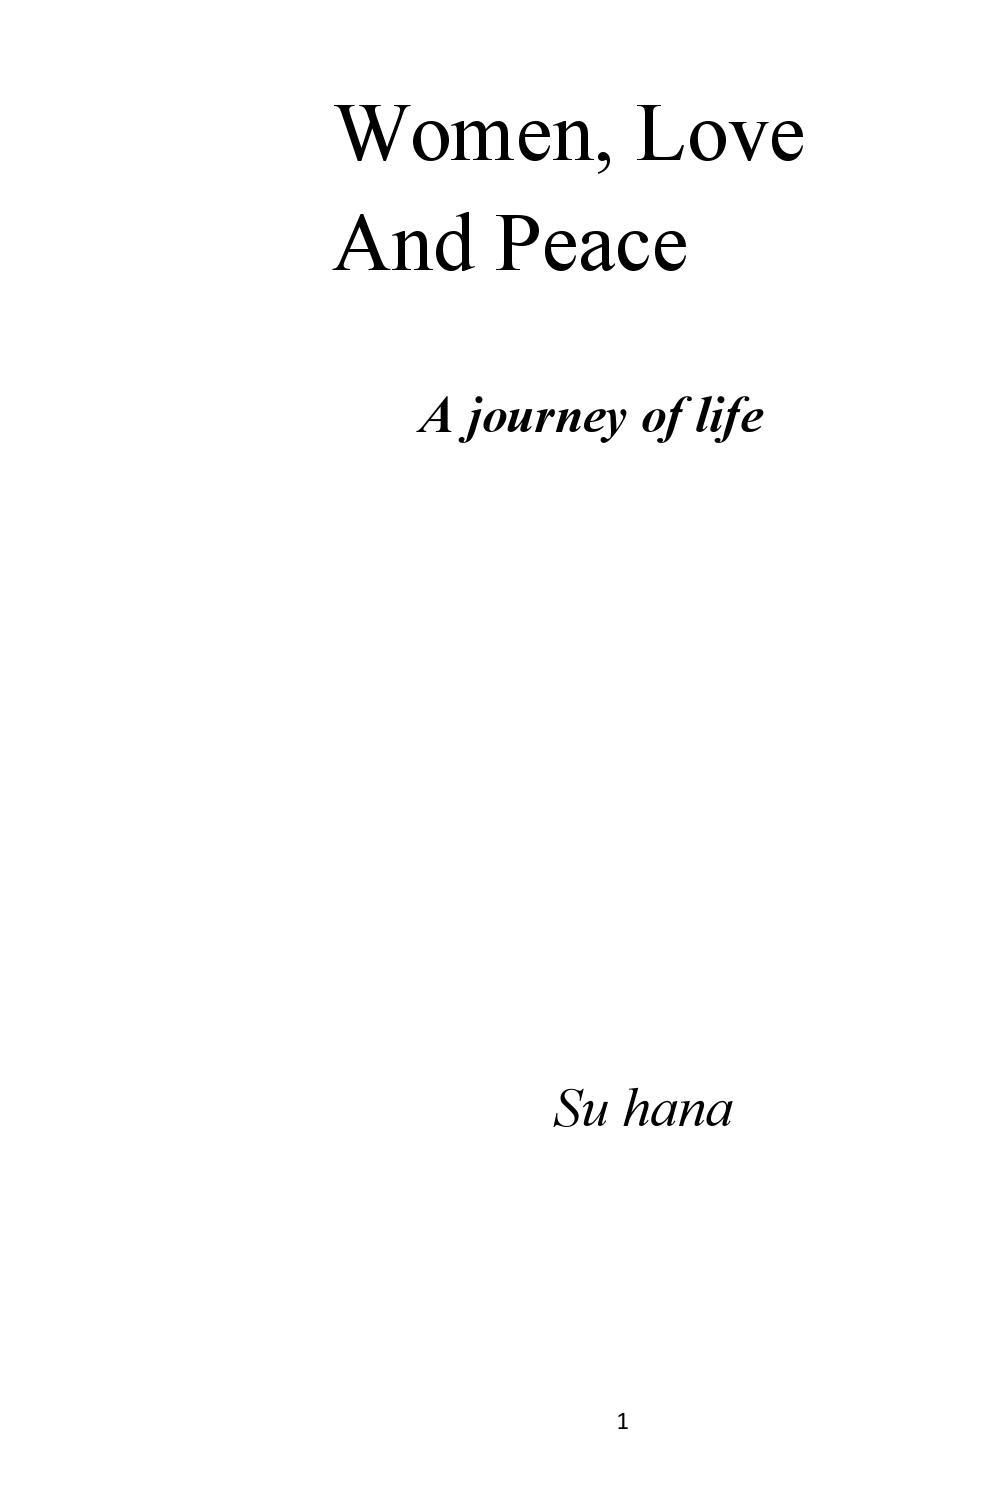 Women, love and peace by Pritis Chandra Majumdar - issuu